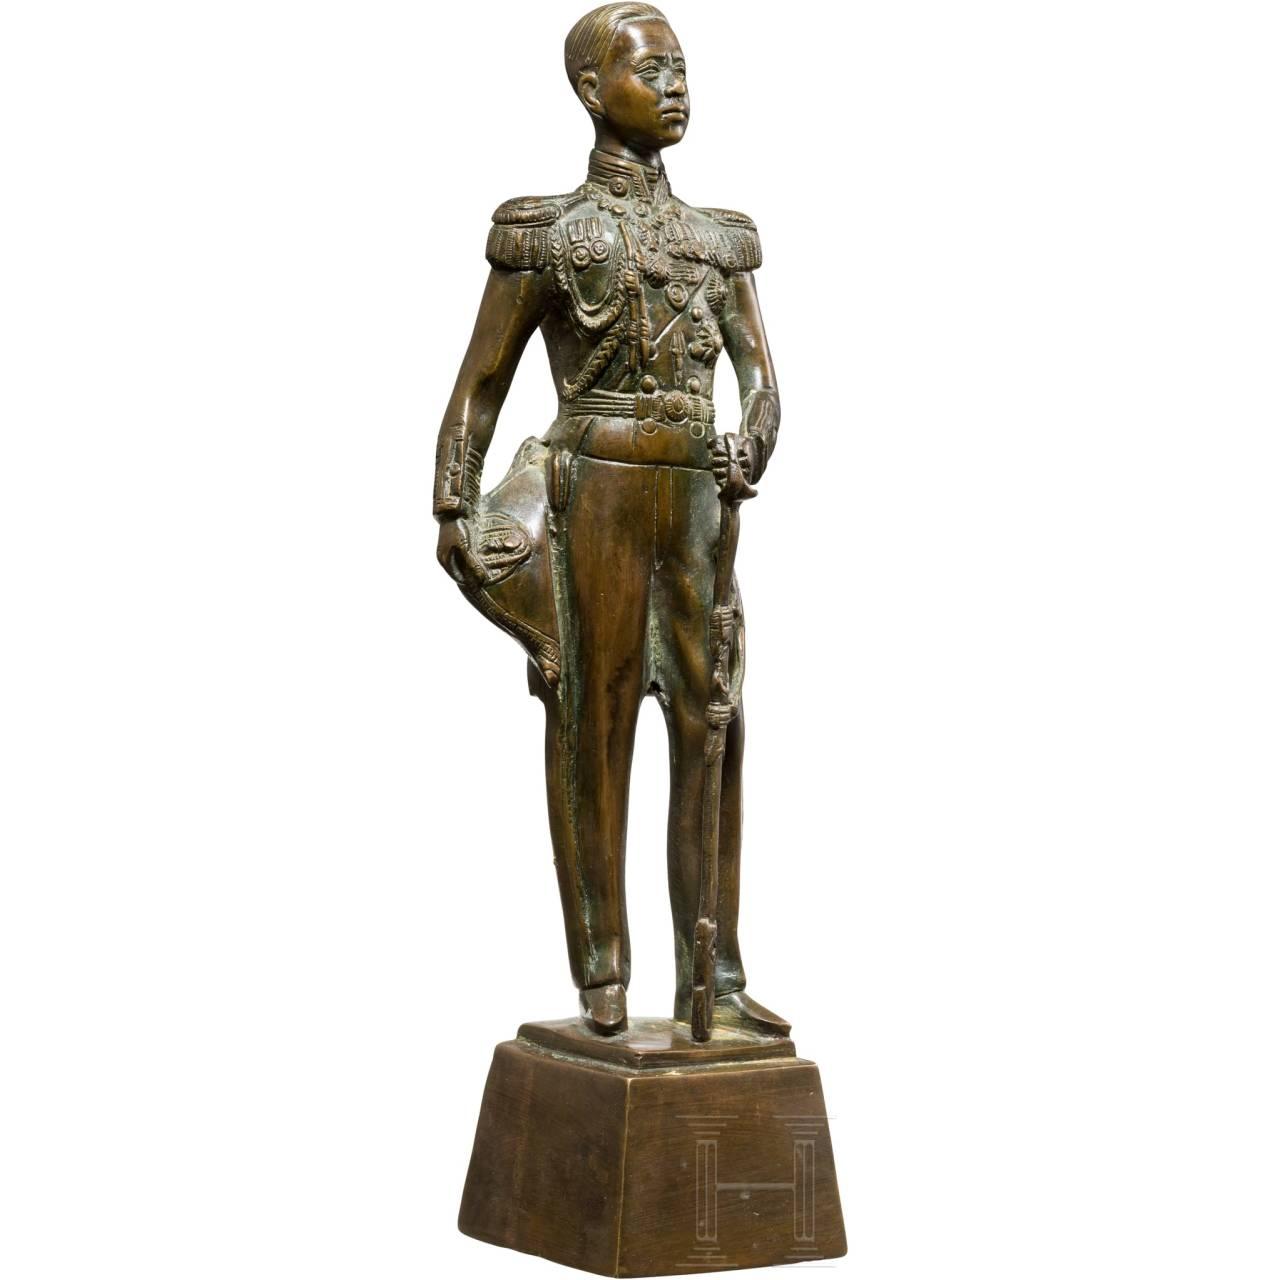 A bronze figure of Prince Chumphon/Sadej Tia (1880 - 1923), Siam, circa 1920